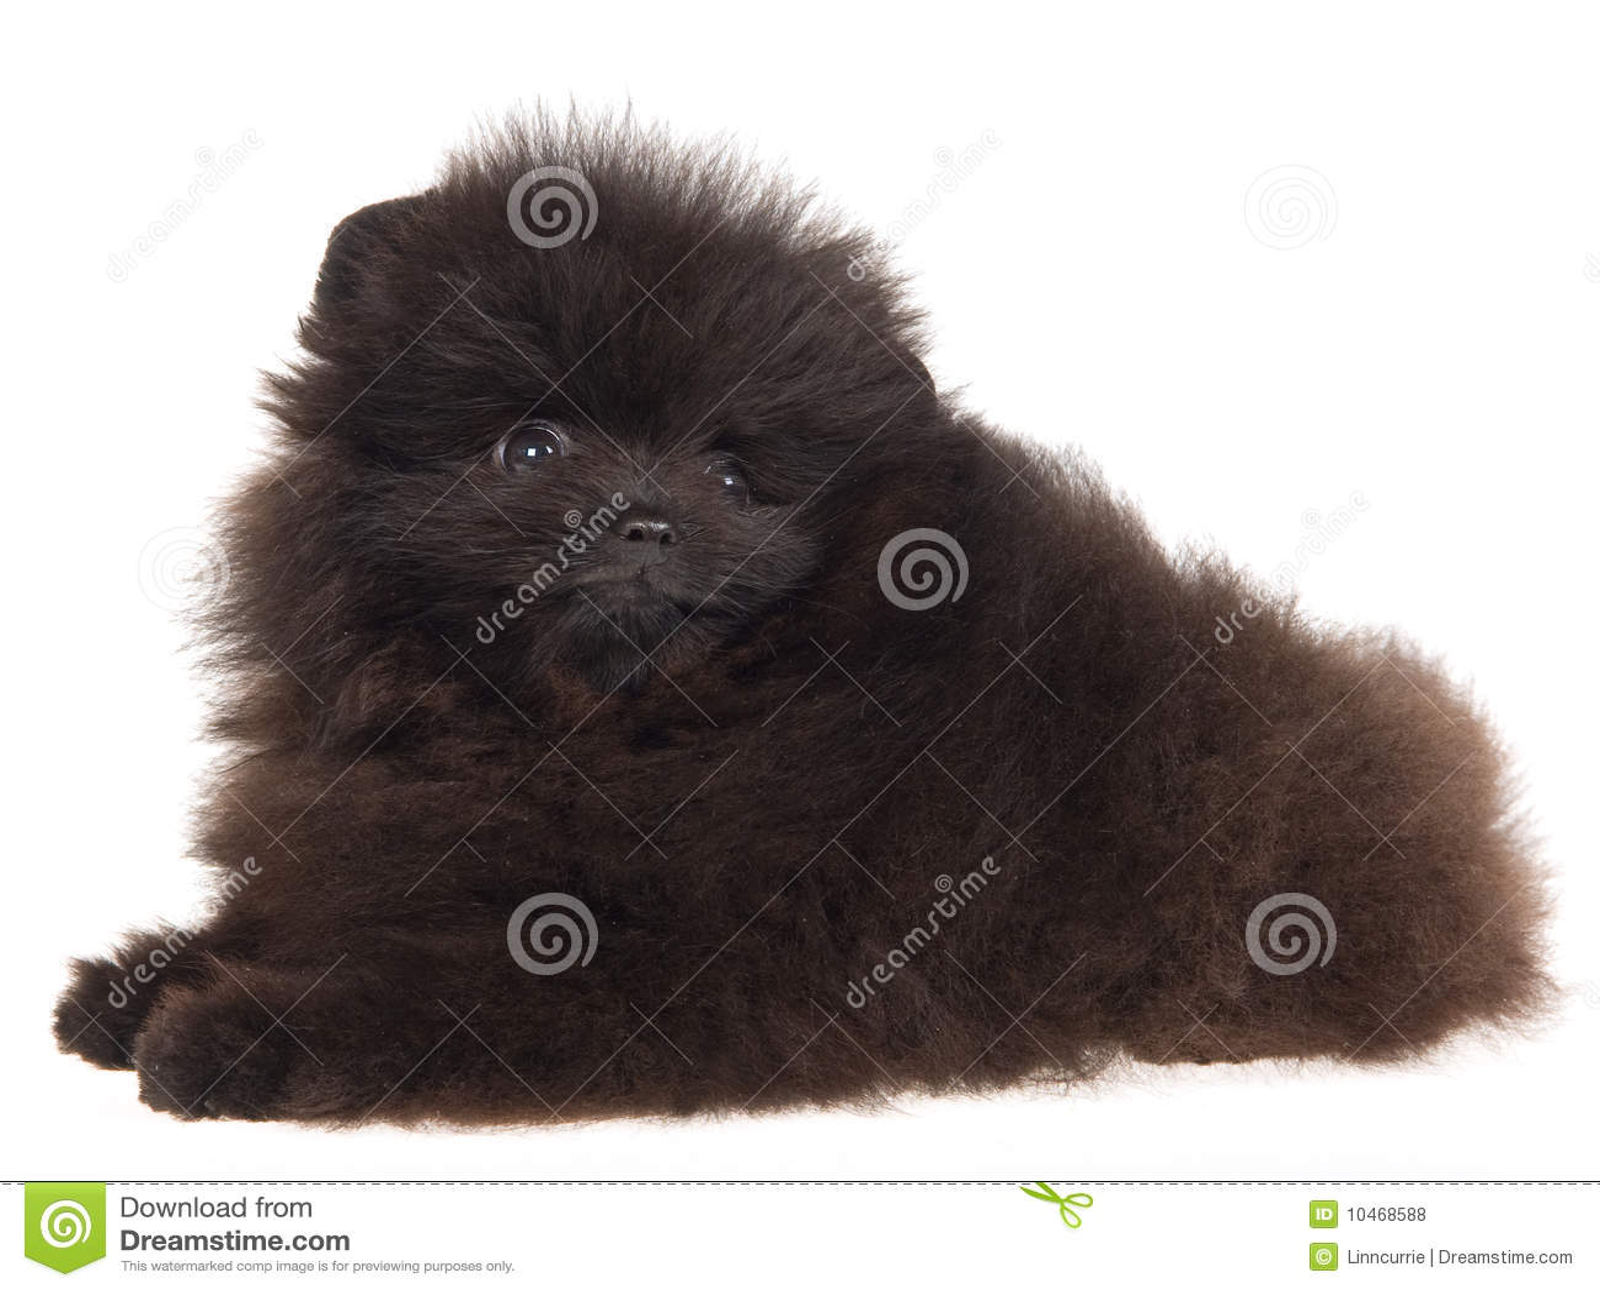 Black Pomeranian puppy on white background